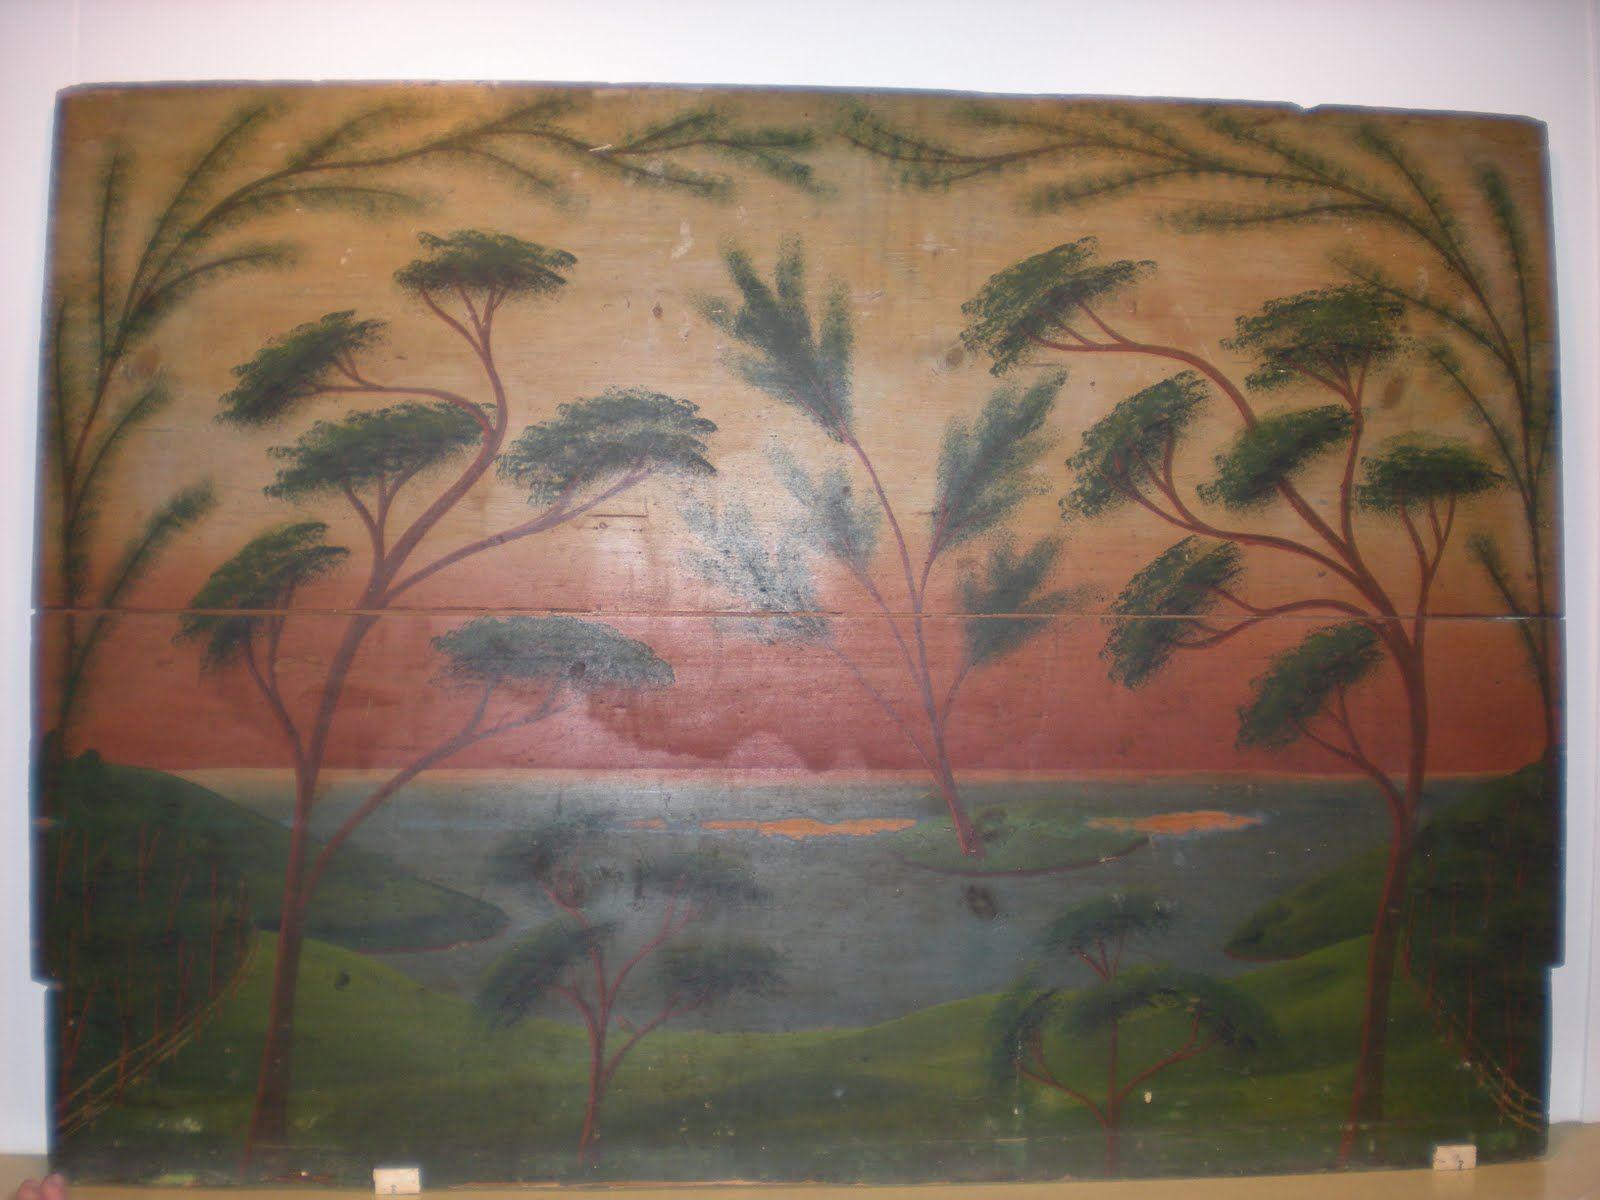 antique fireboard Google Search American folk art